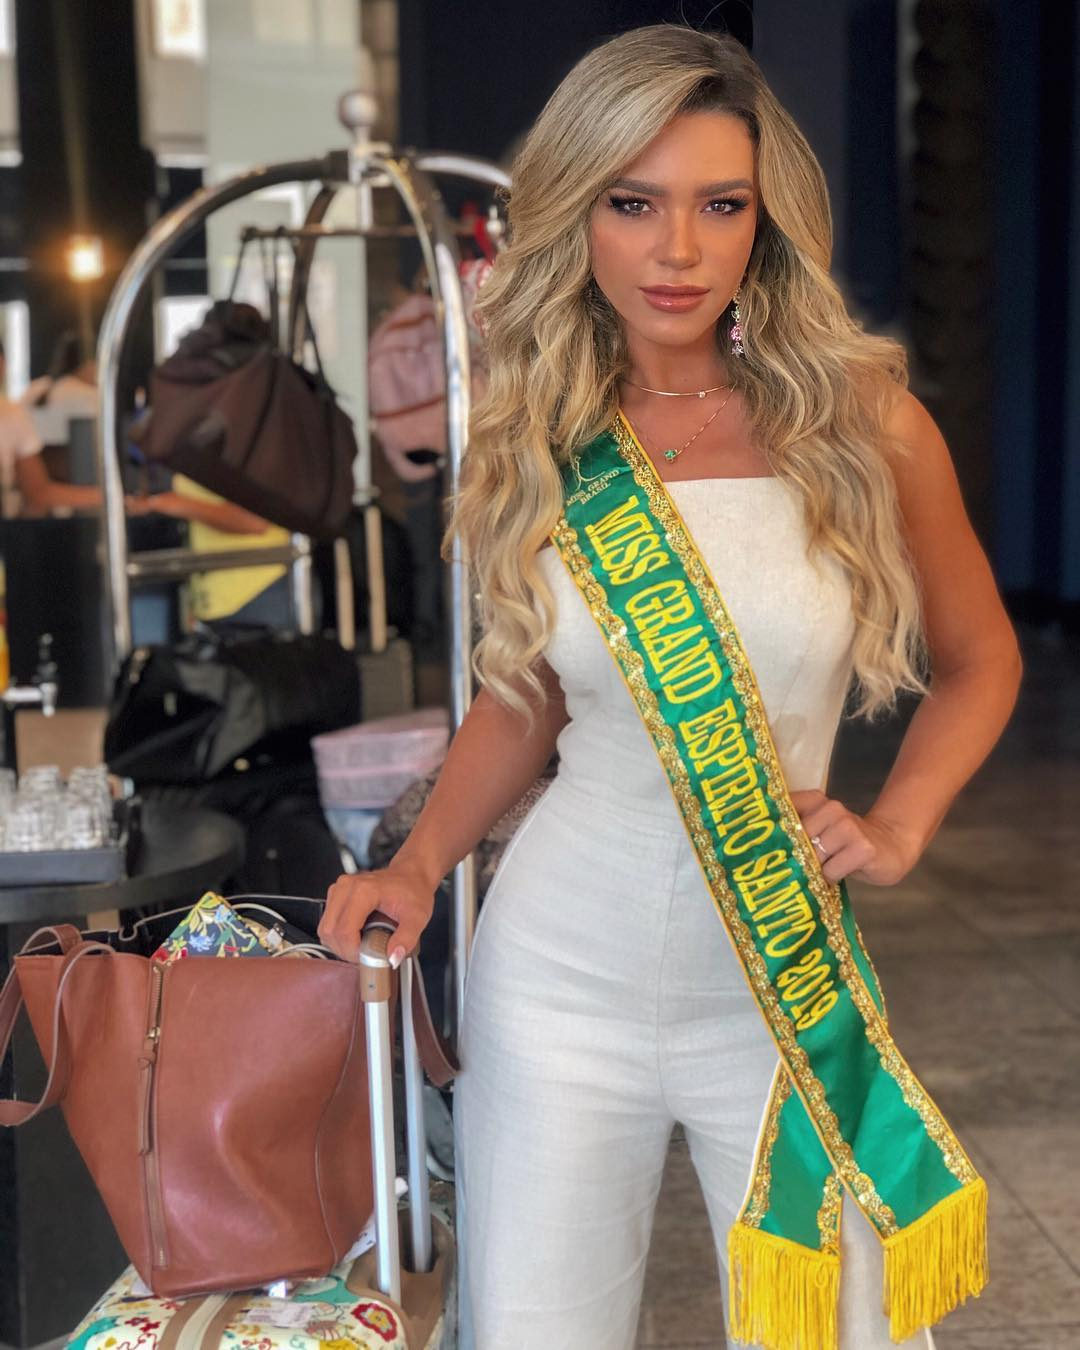 amanda cardoso, miss grand espirito santo 2019/3rd runner-up de miss intercontinental 2017. - Página 13 52340210